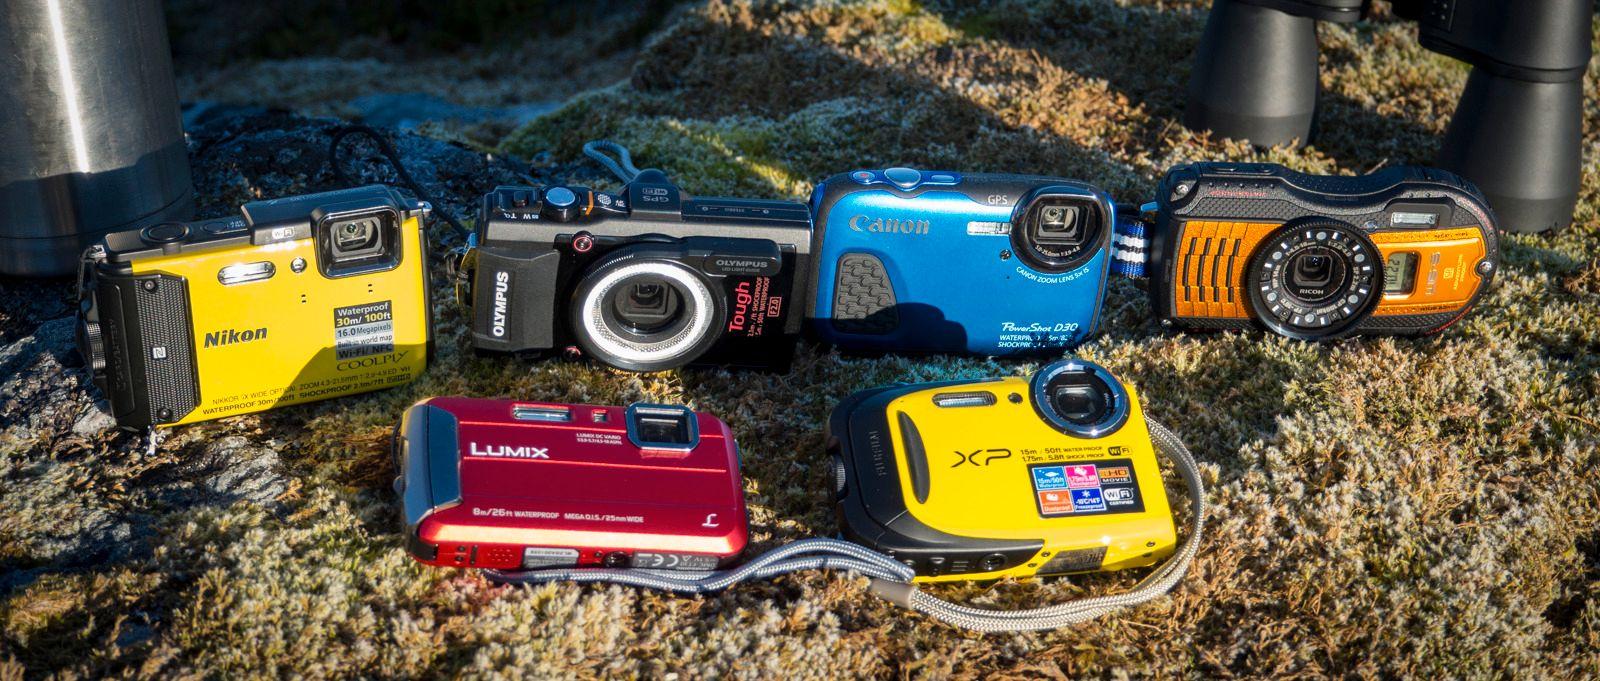 Bak fra venstre: Nikon Coolpix AW130, Olympus Tough TG-4, Canon PowerShot D30 og Ricoh WG-5 GPS. Foran, fra venstre: Panasonic Lumix DMC-TS30, Fujifilm FinePix XP80. Foto: Kristoffer Møllevik